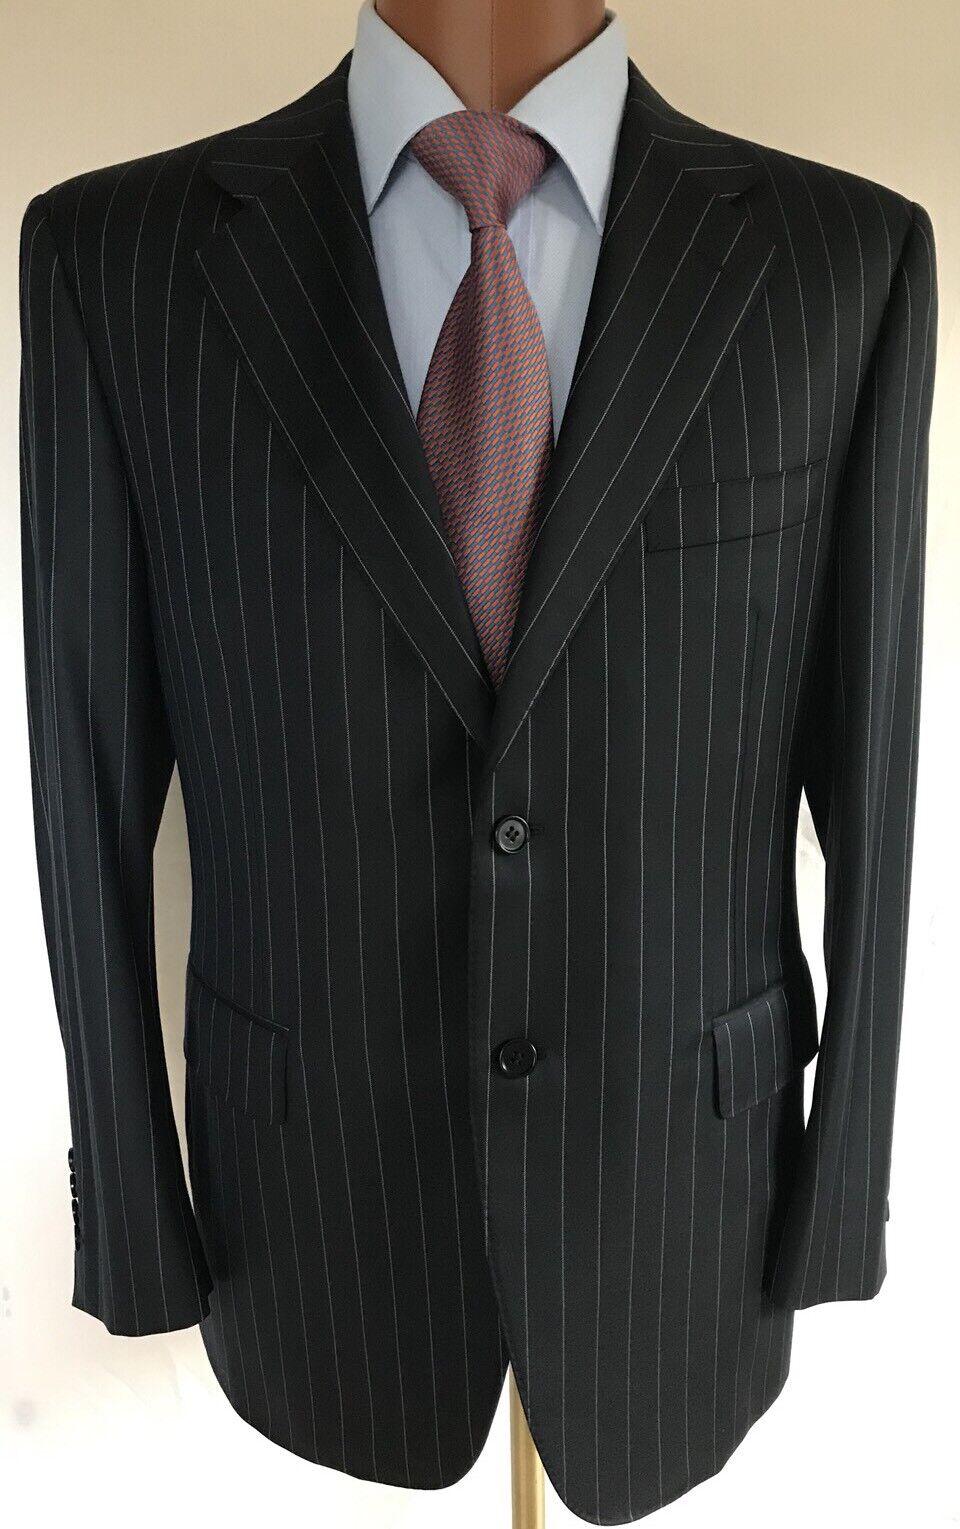 4daeaf19d1 Canali Pin Stripe Suit Size 50 6 C, Please Look Photos For Measurements